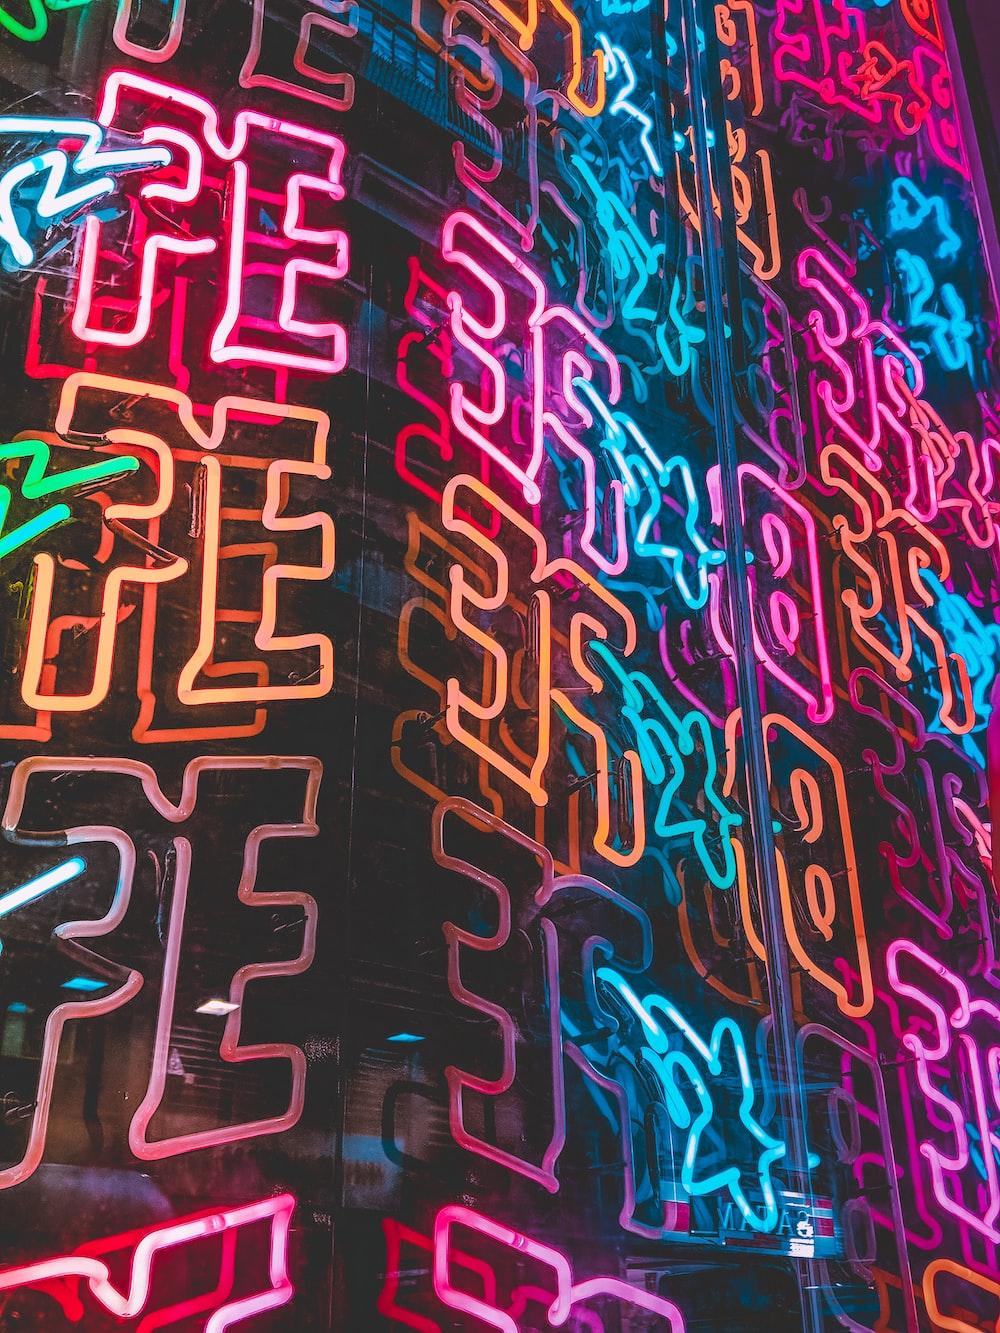 orange, pink, and blue neon lights decoration